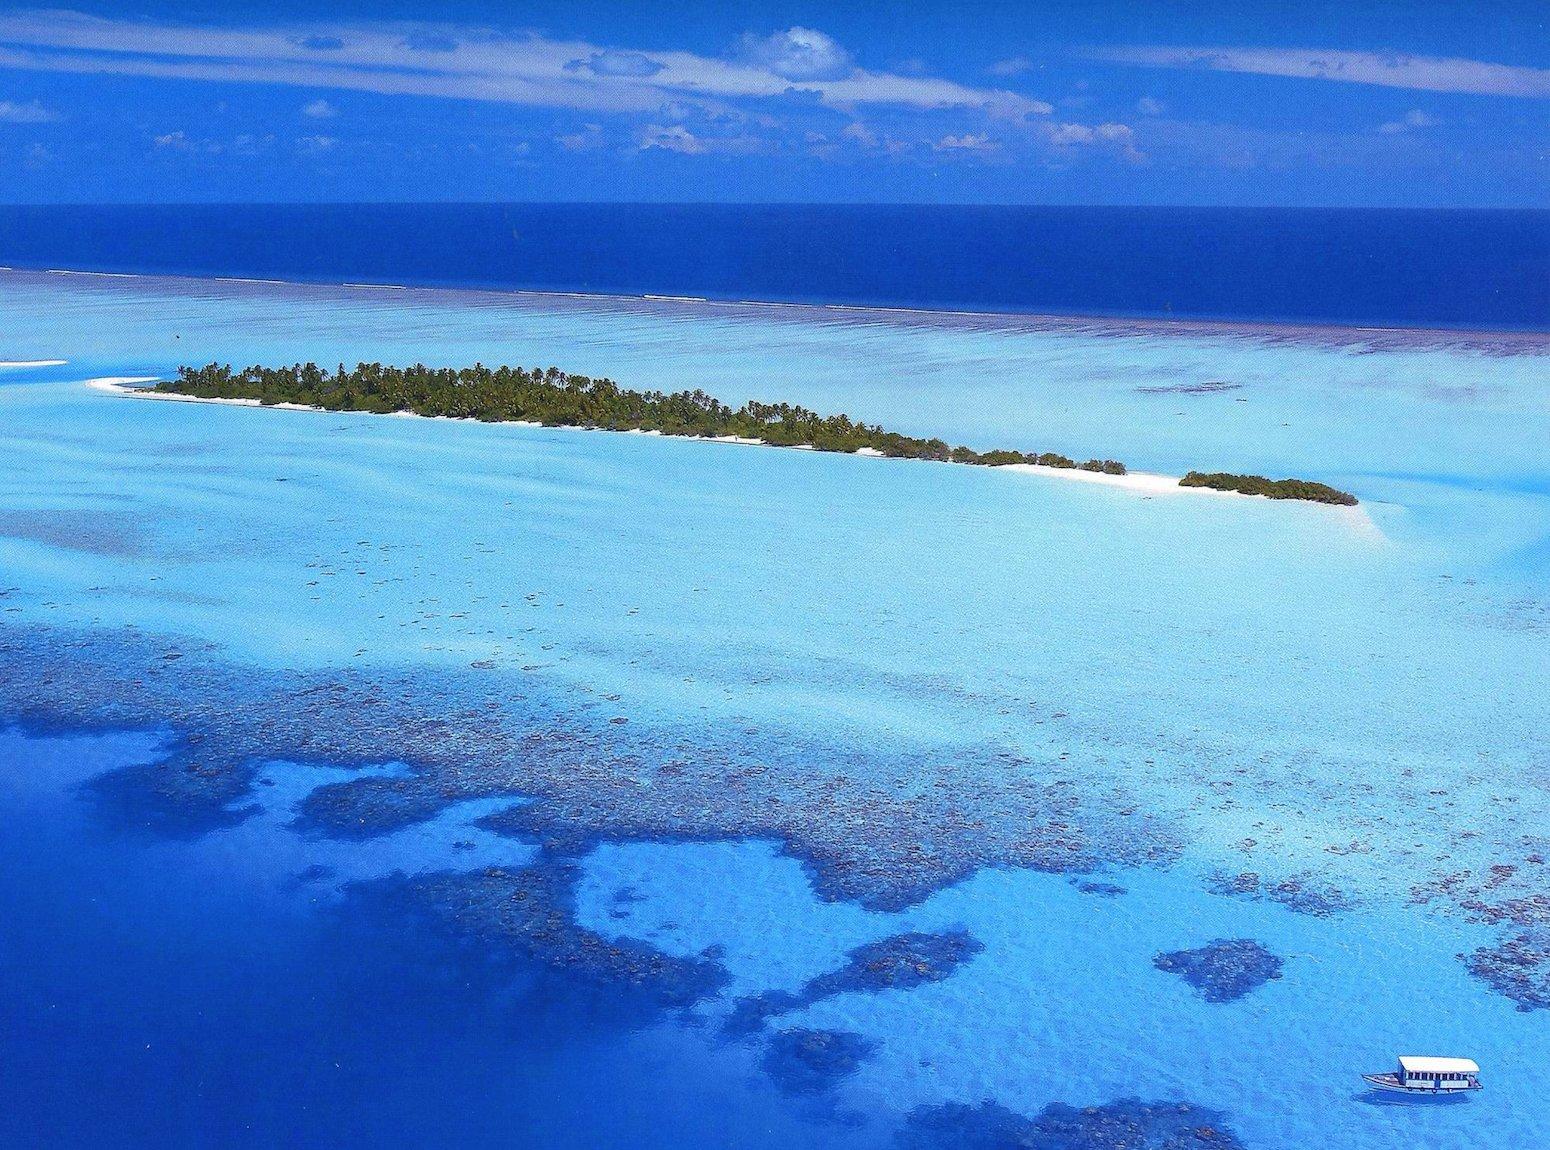 maldives-itinerary-route-10-days-sailing-boat